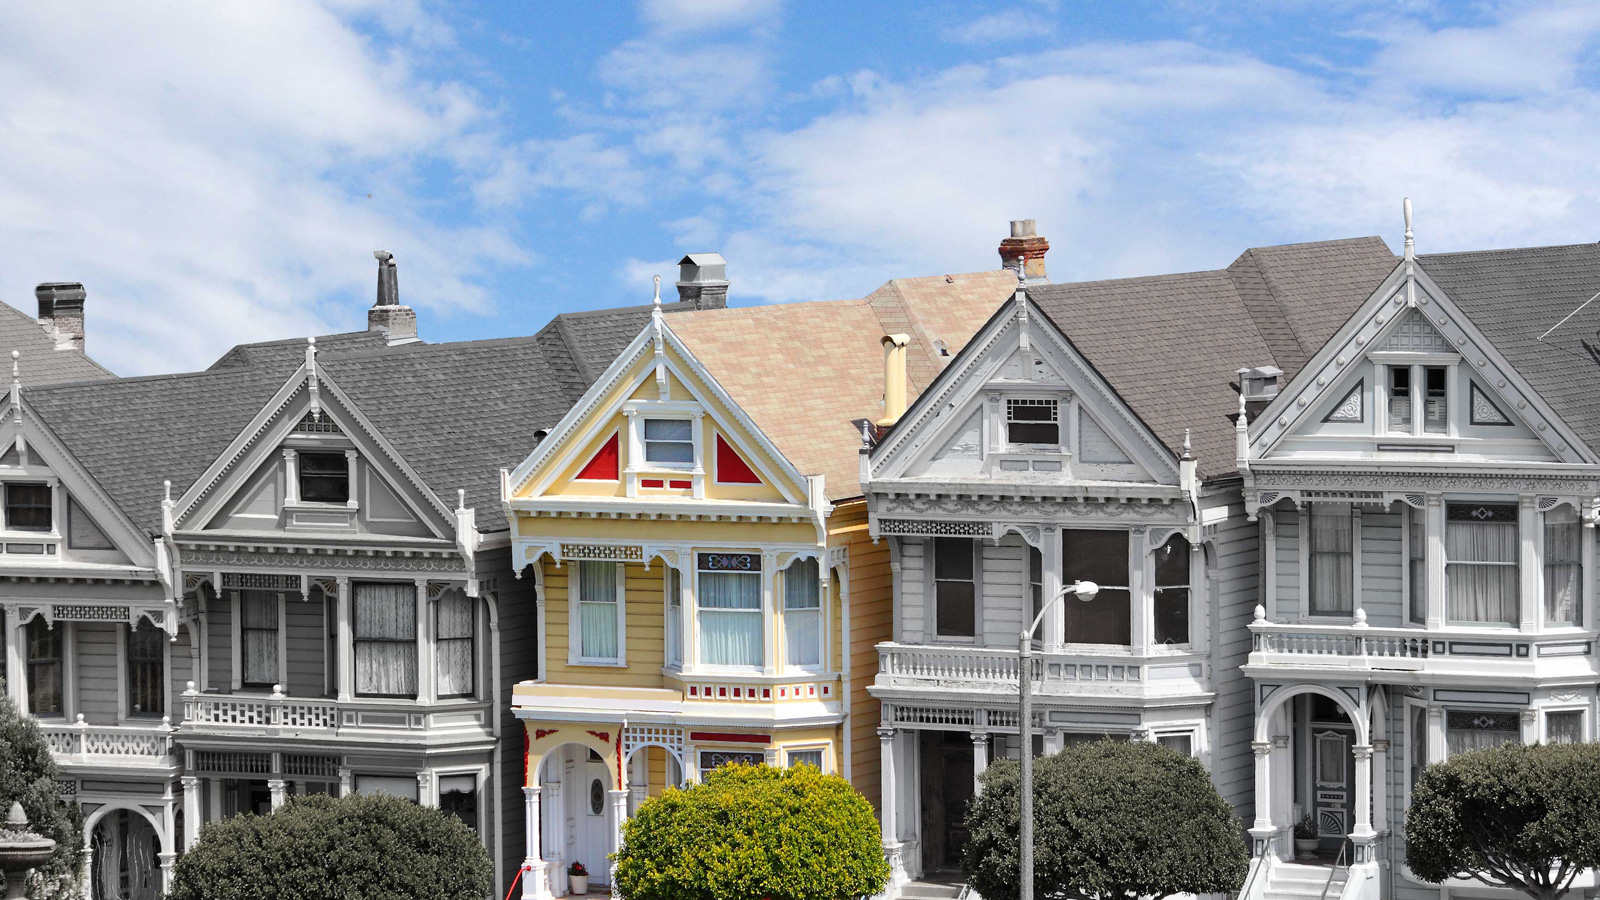 Restoration Home Painting Slider by Graham Nunn